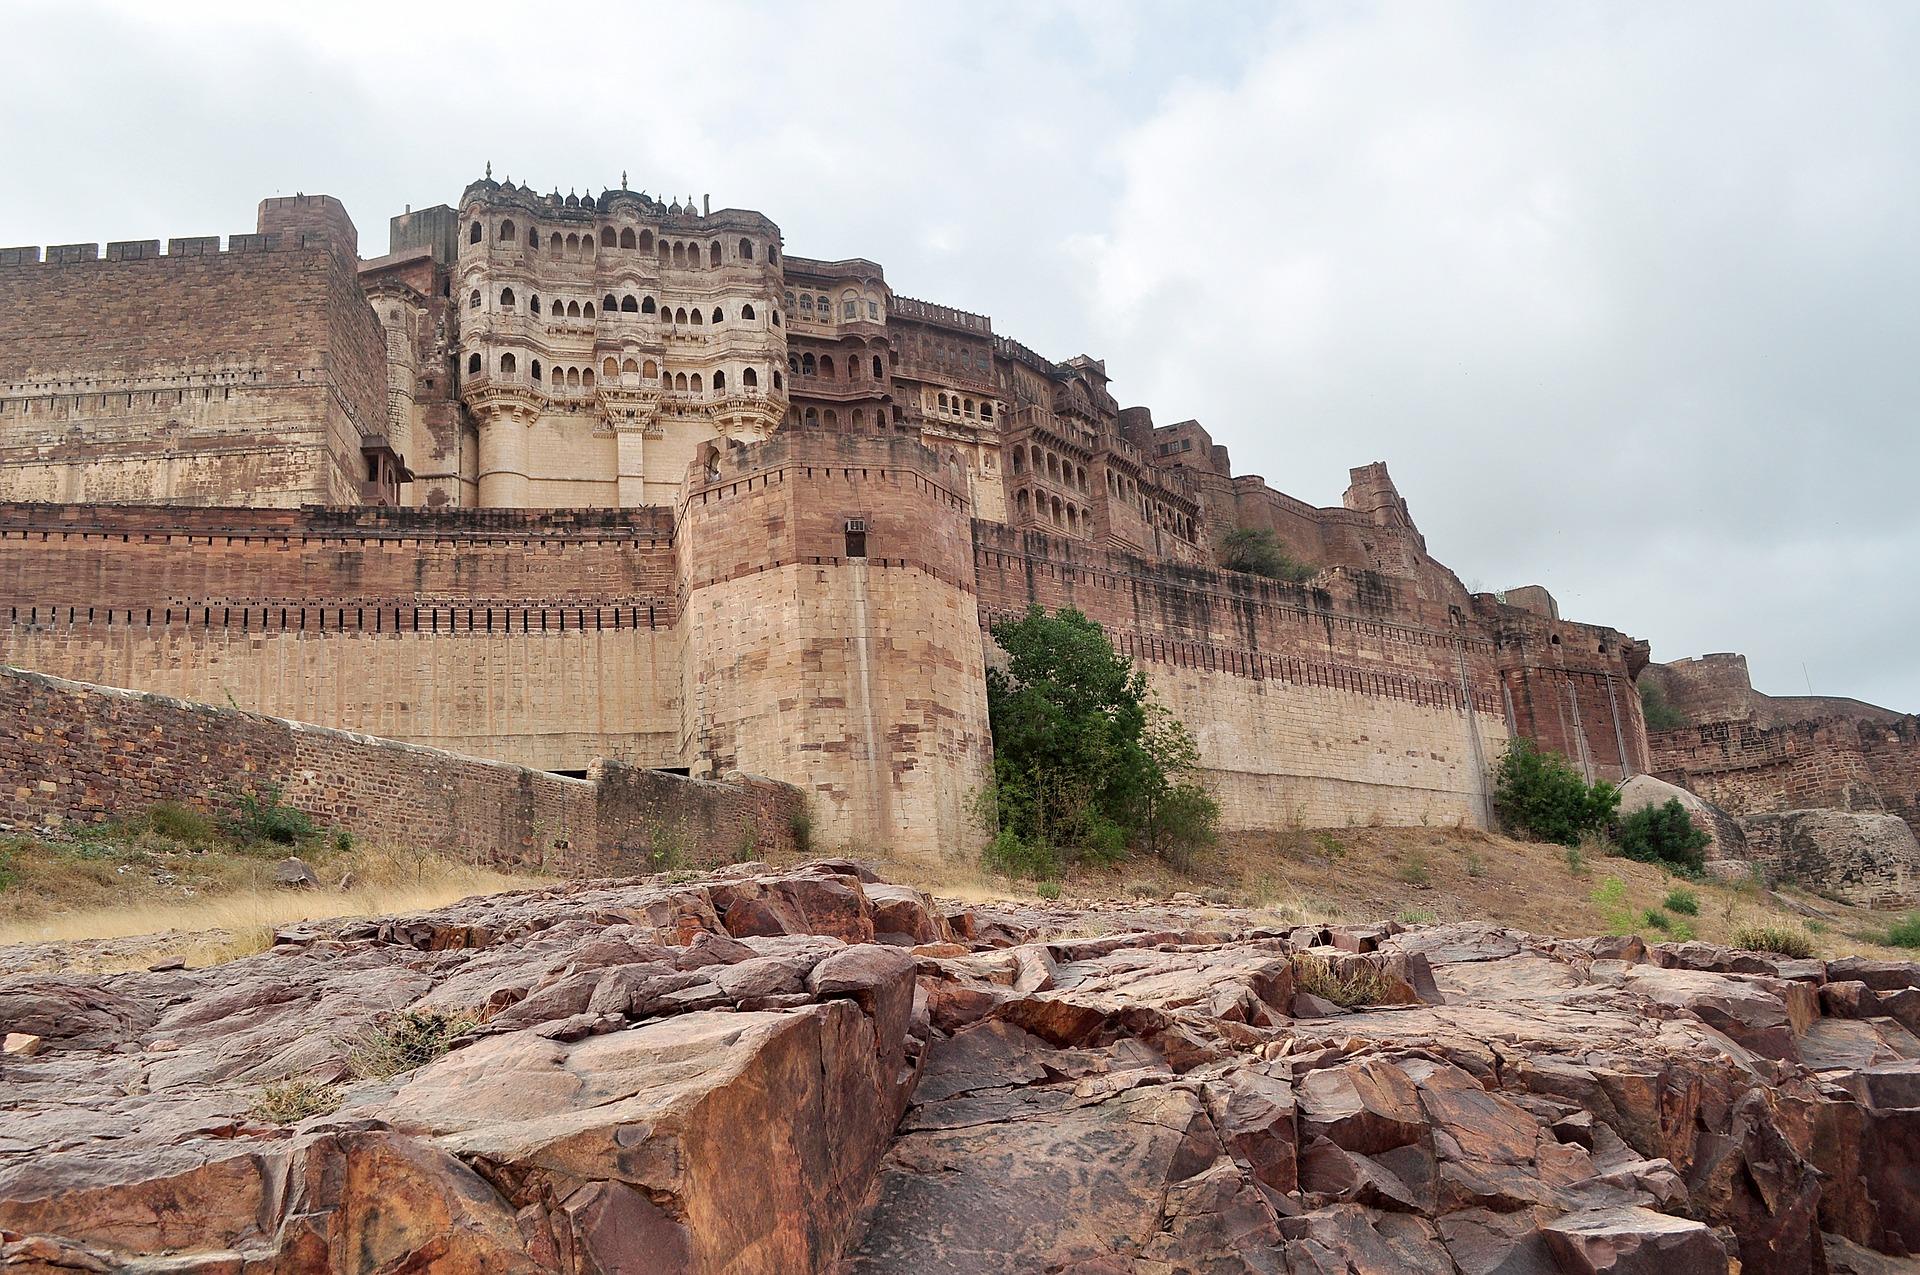 Travel to Rajasthan 5 Nights / 6 Days from Surat - Gujarat